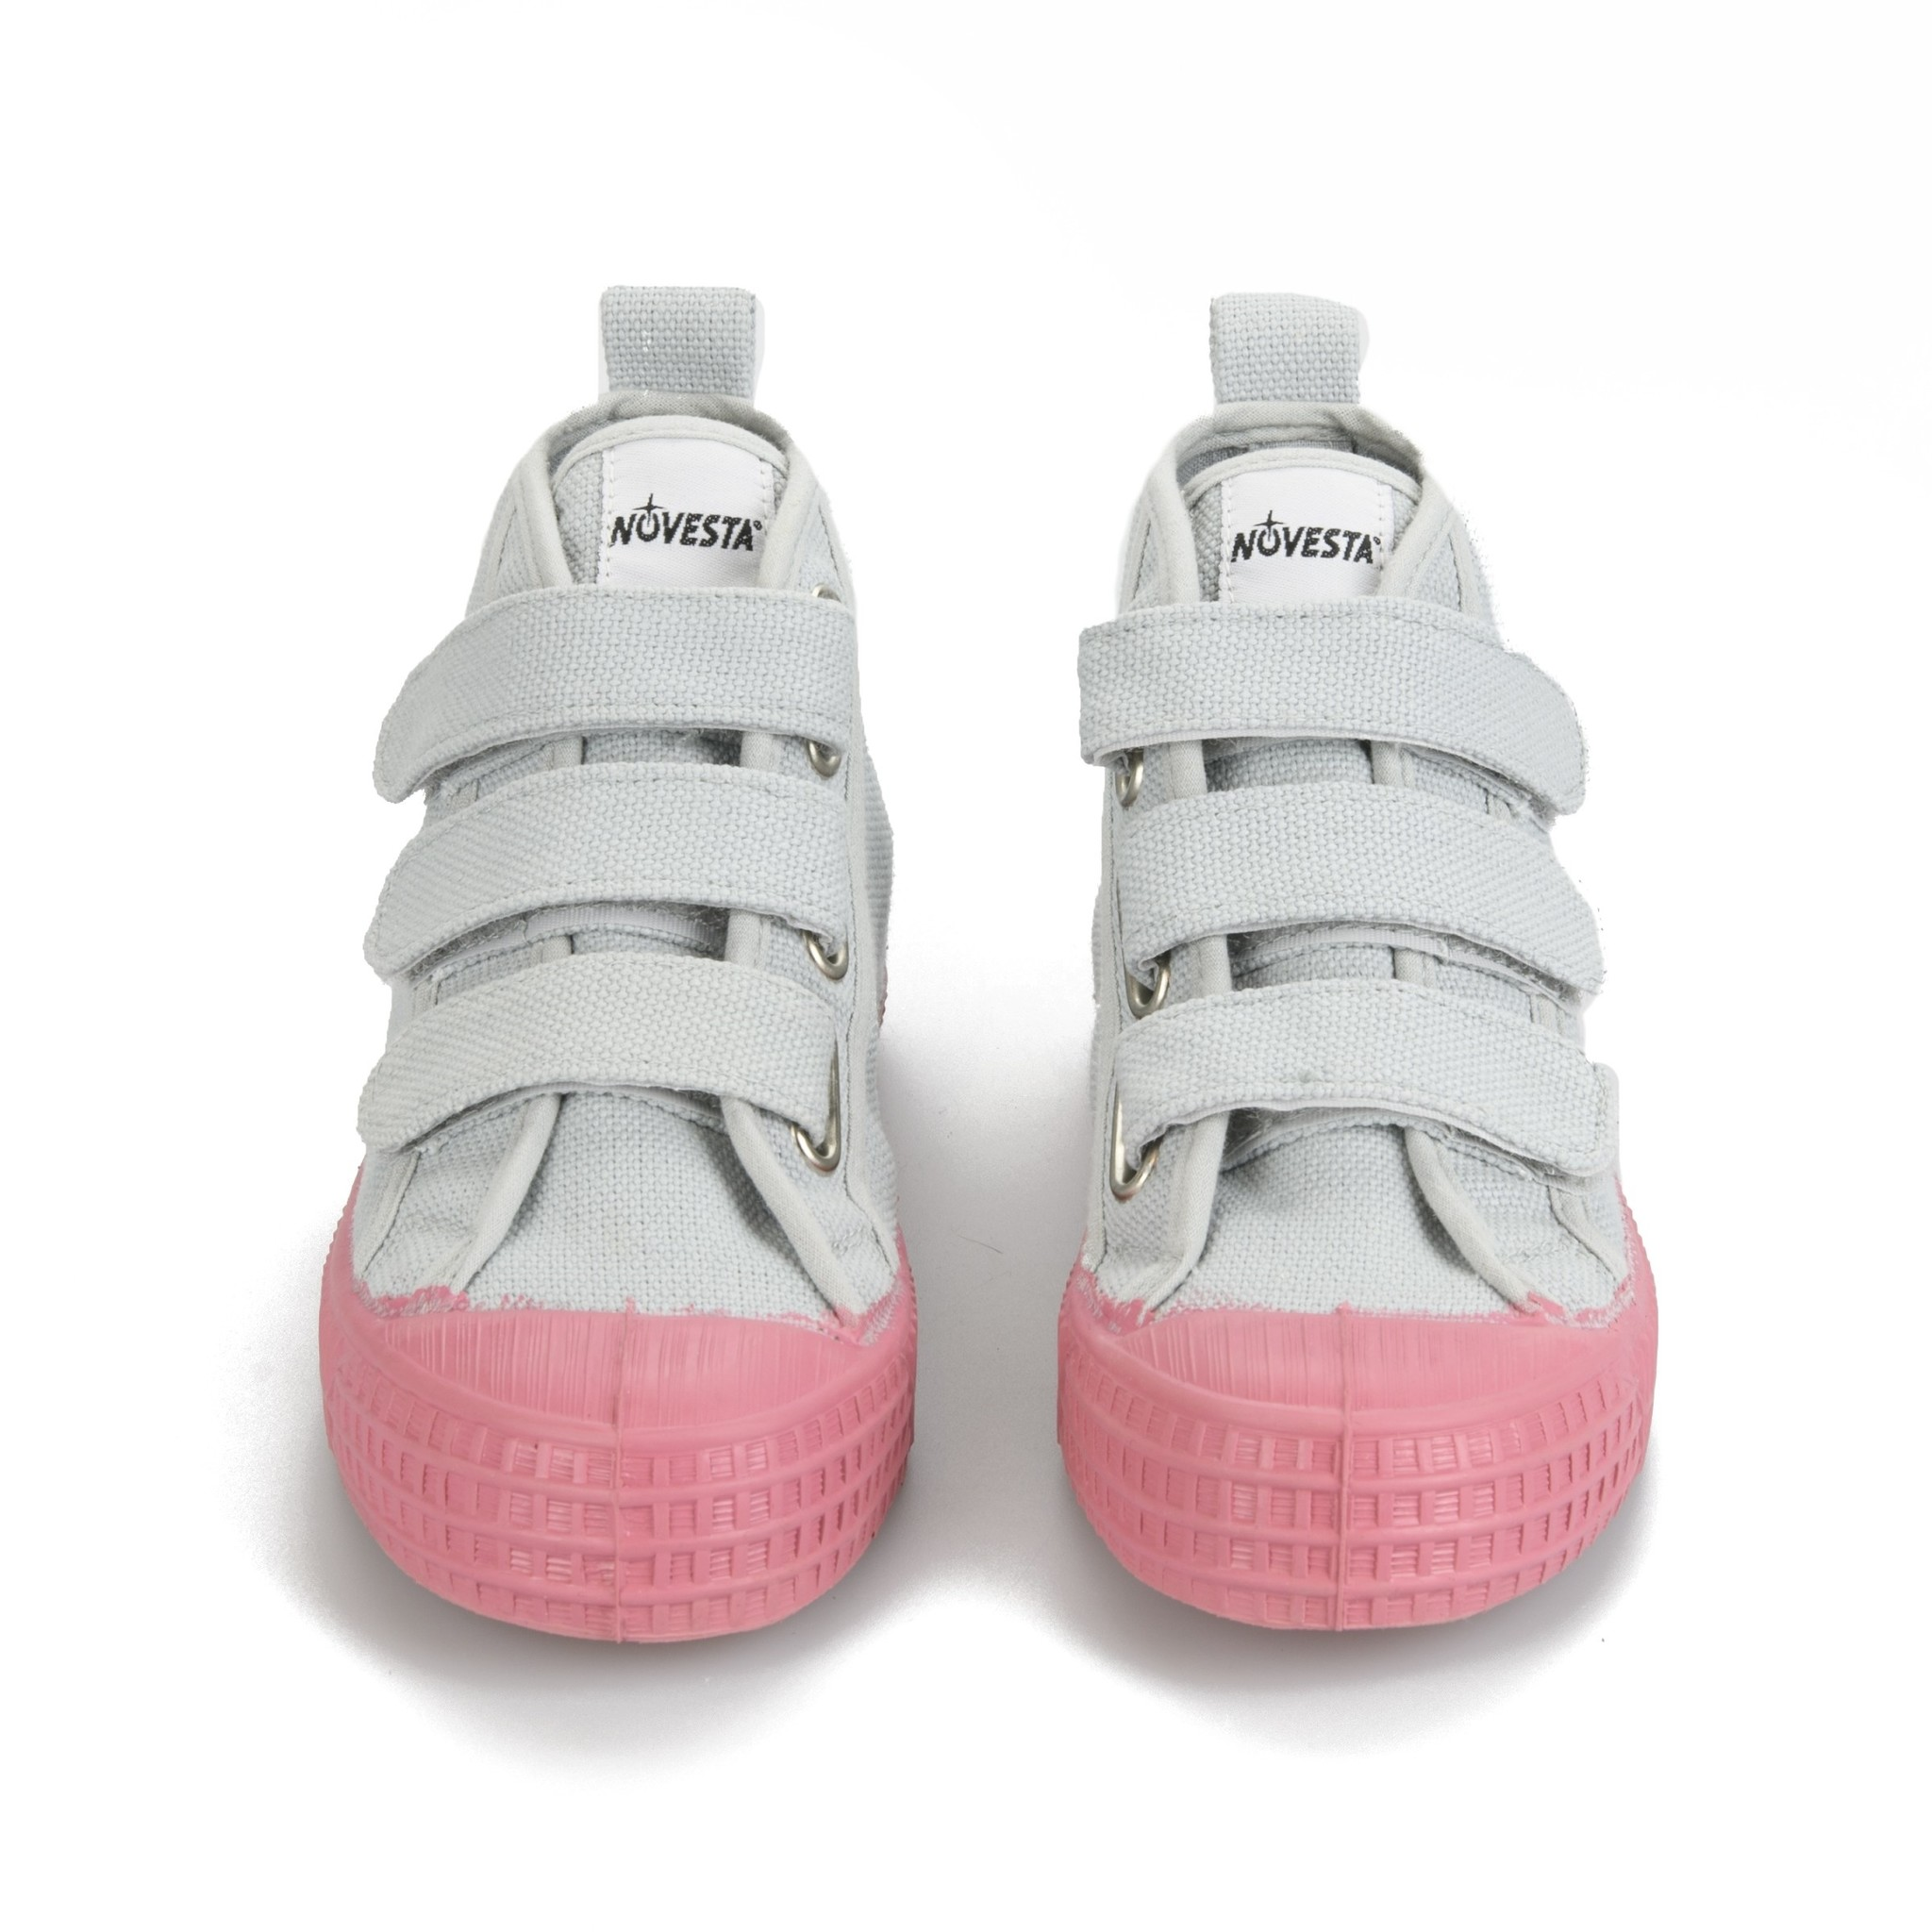 STAR DRIBBLE KID - Grey / Pink-2